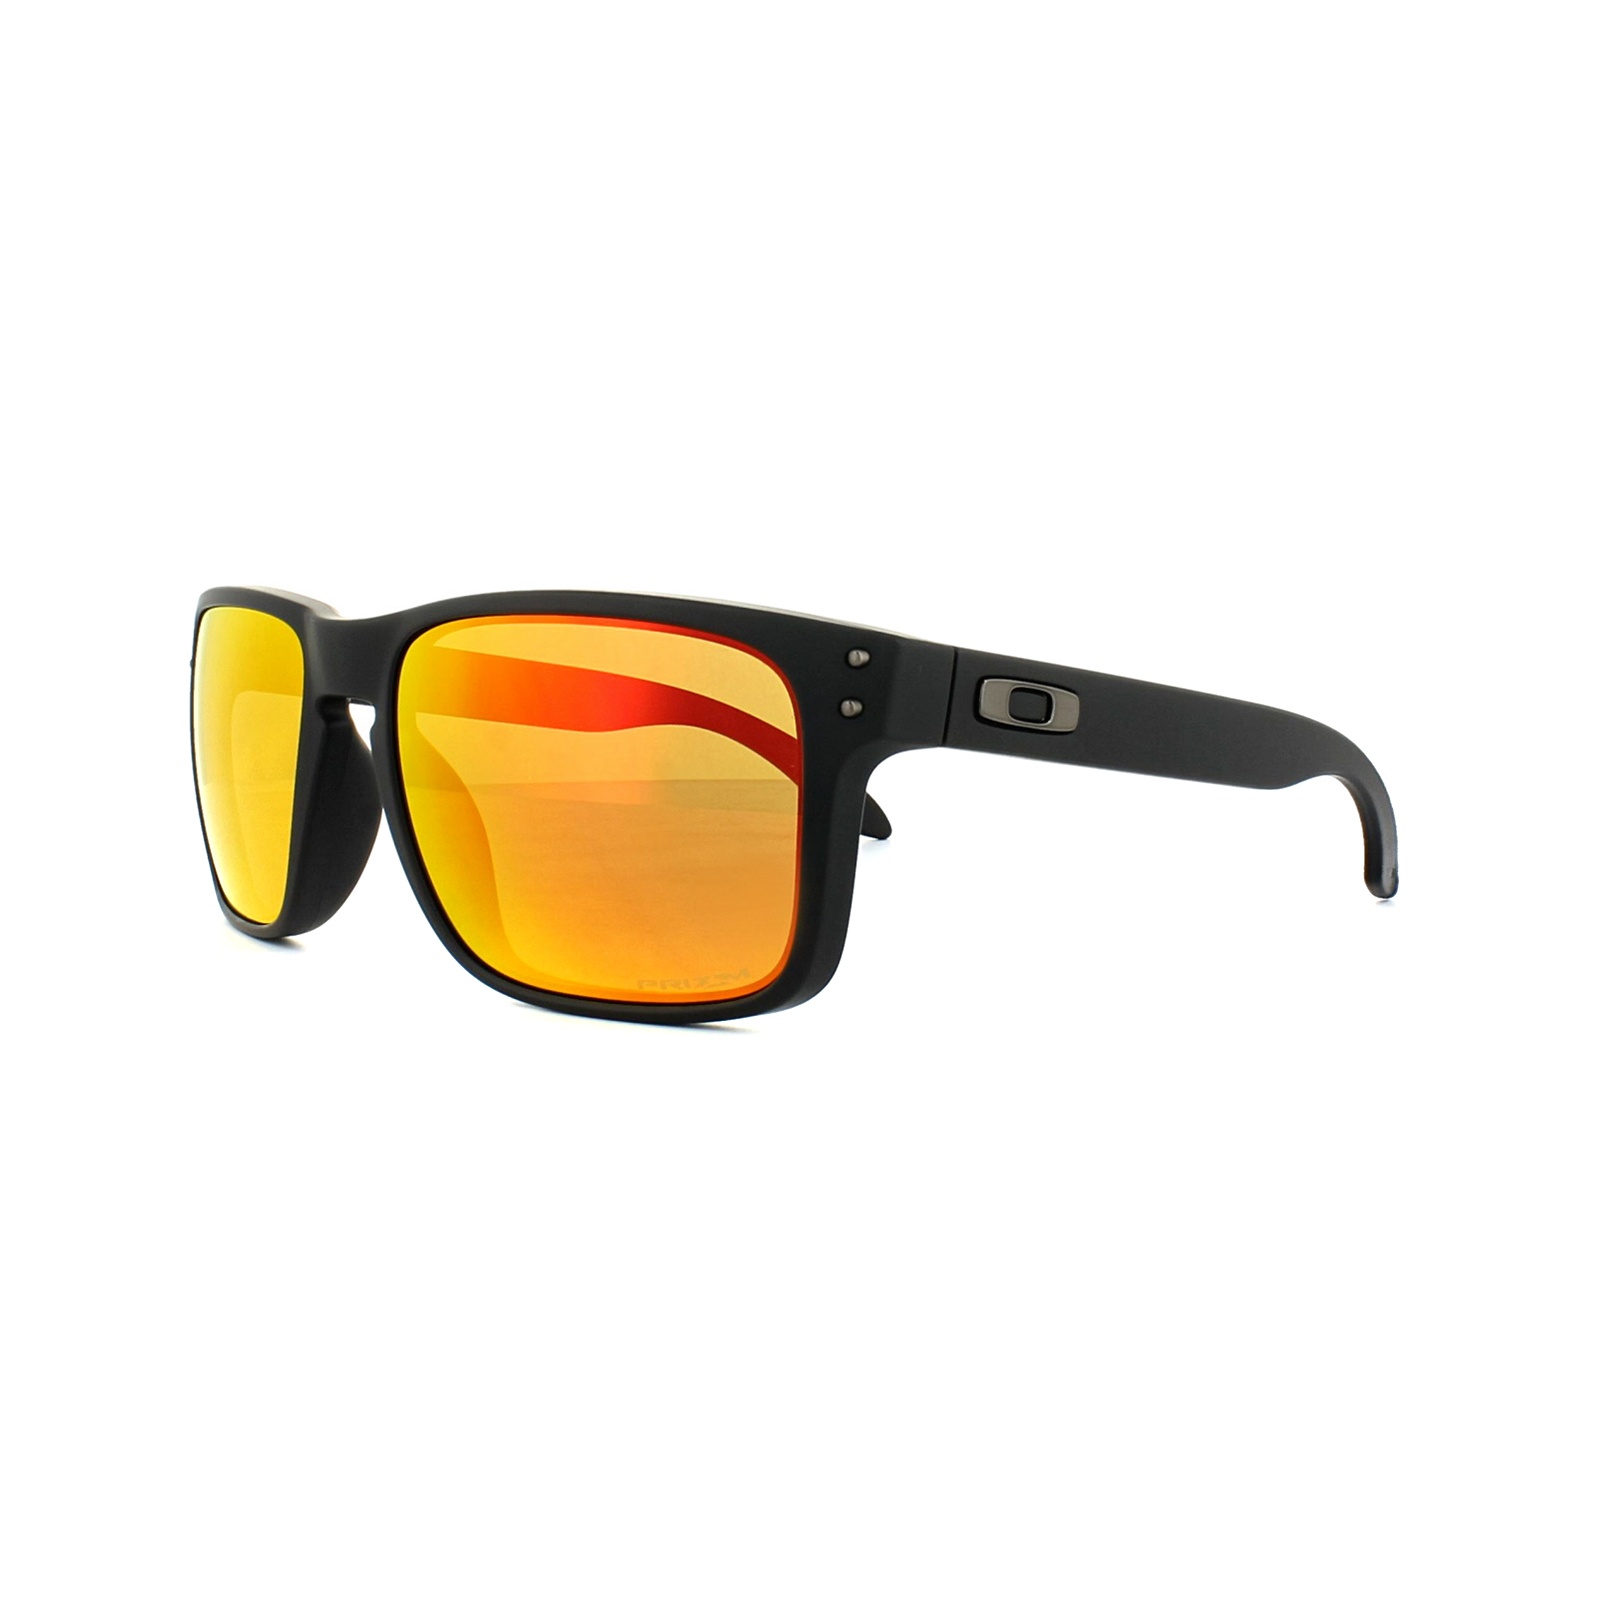 c03500cecb Sentinel Oakley Sunglasses Holbrook OO9102-E2 Matt Black Prizm Ruby